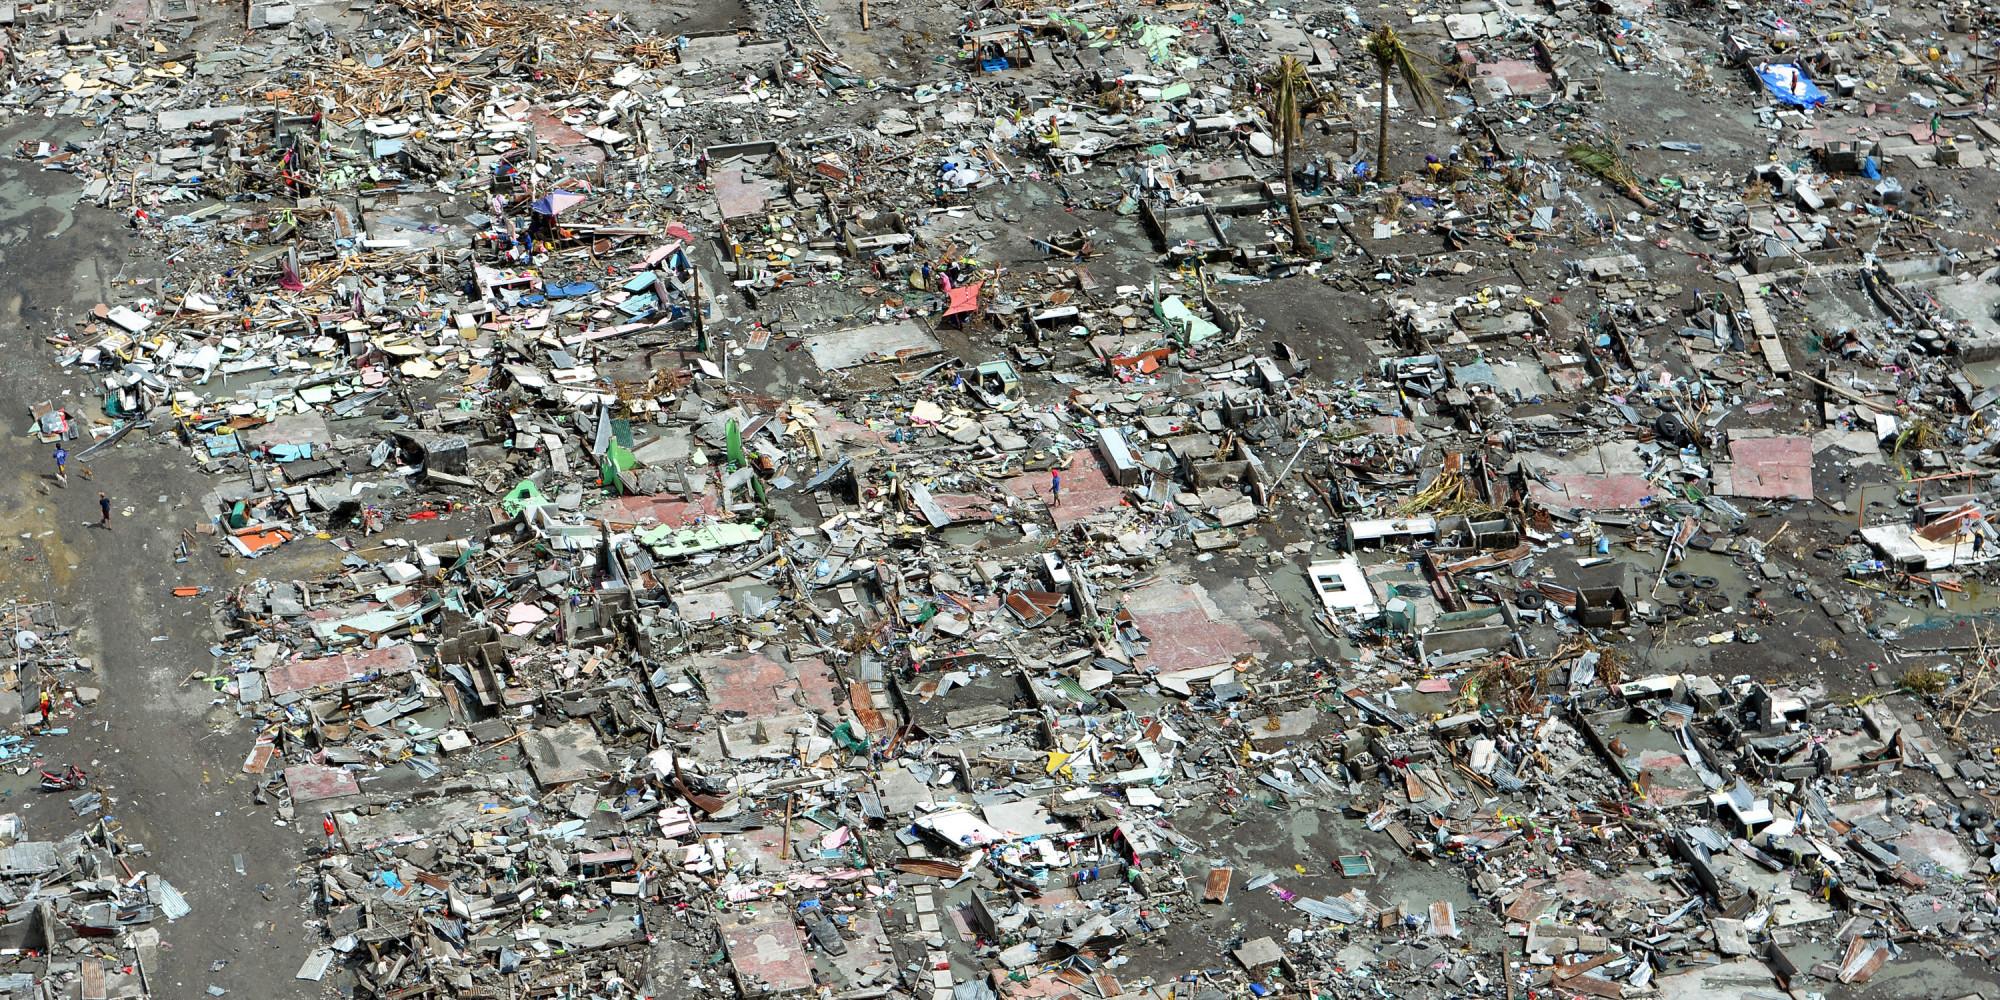 Typhoon Haiyan Aerial Photos_n_4260061 on After Typhoon Haiyan Devastated Central Philippines On November 8